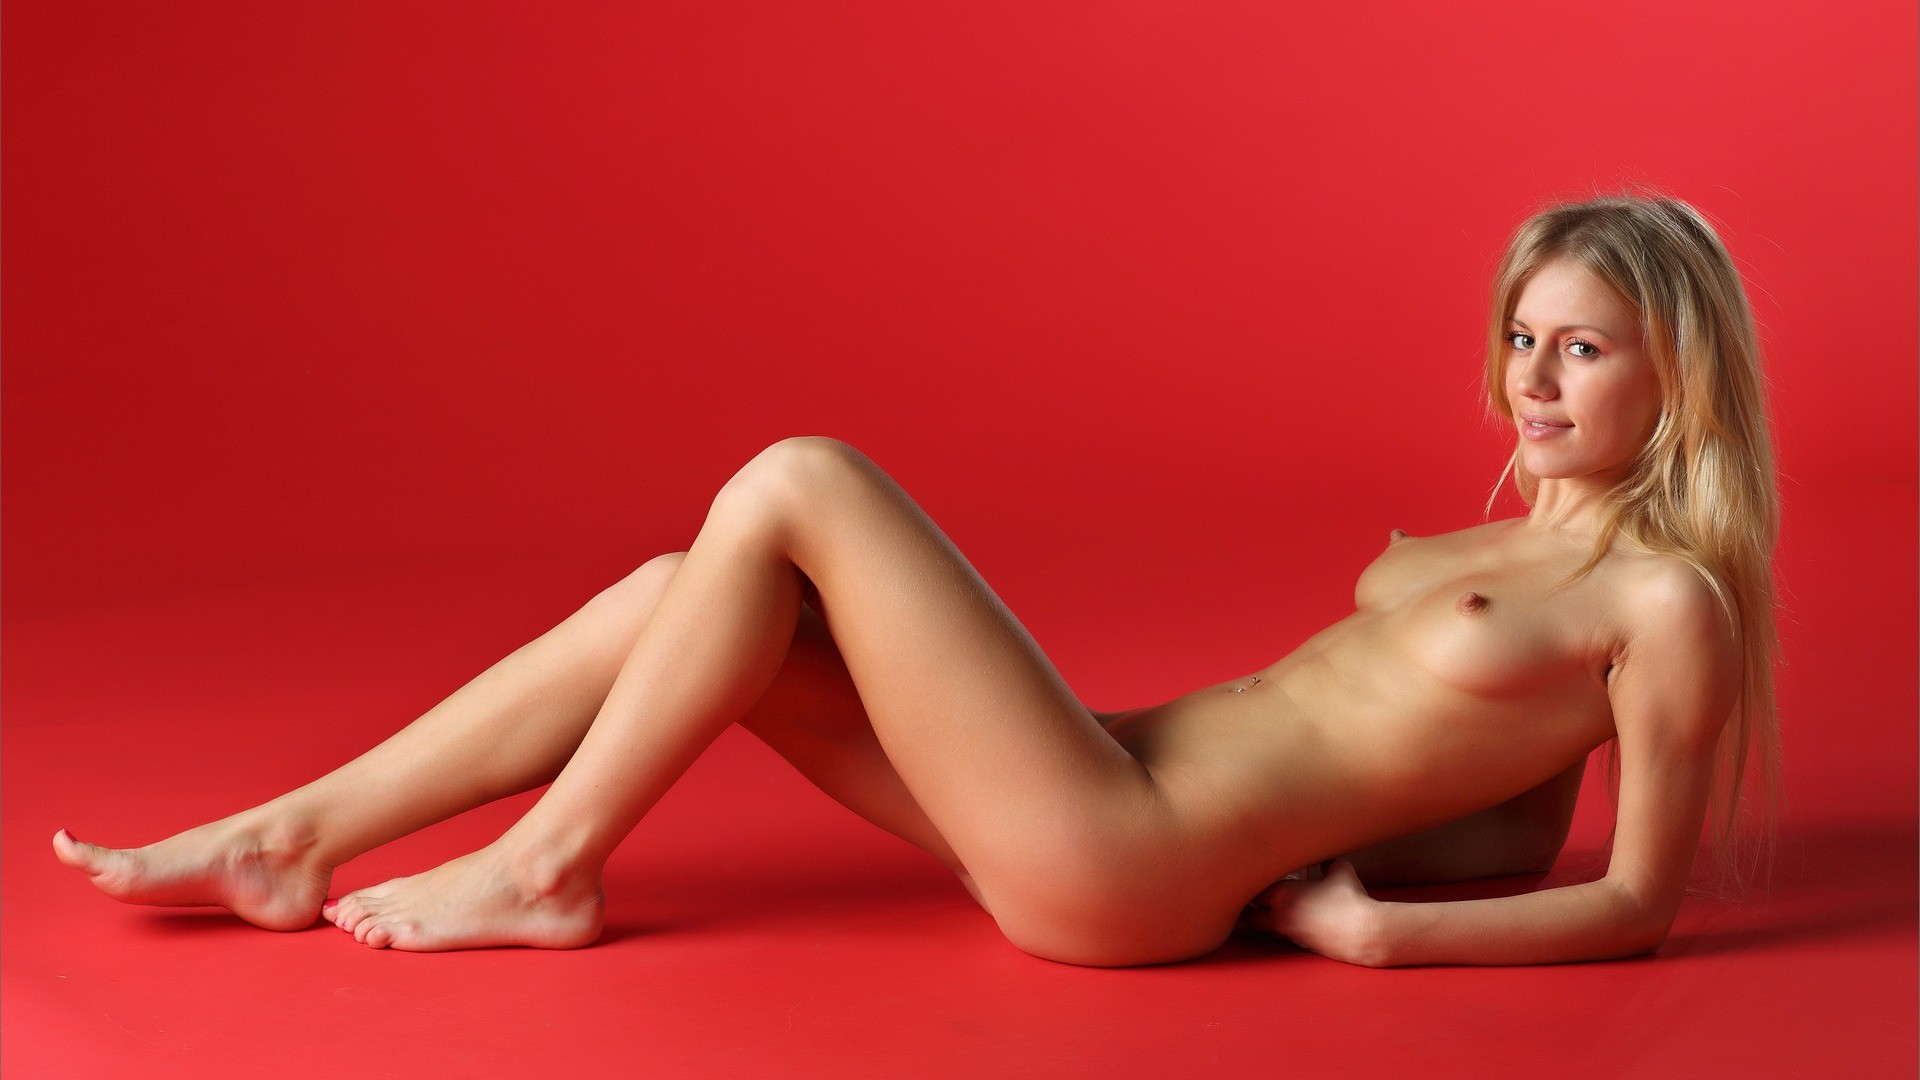 naked blondes